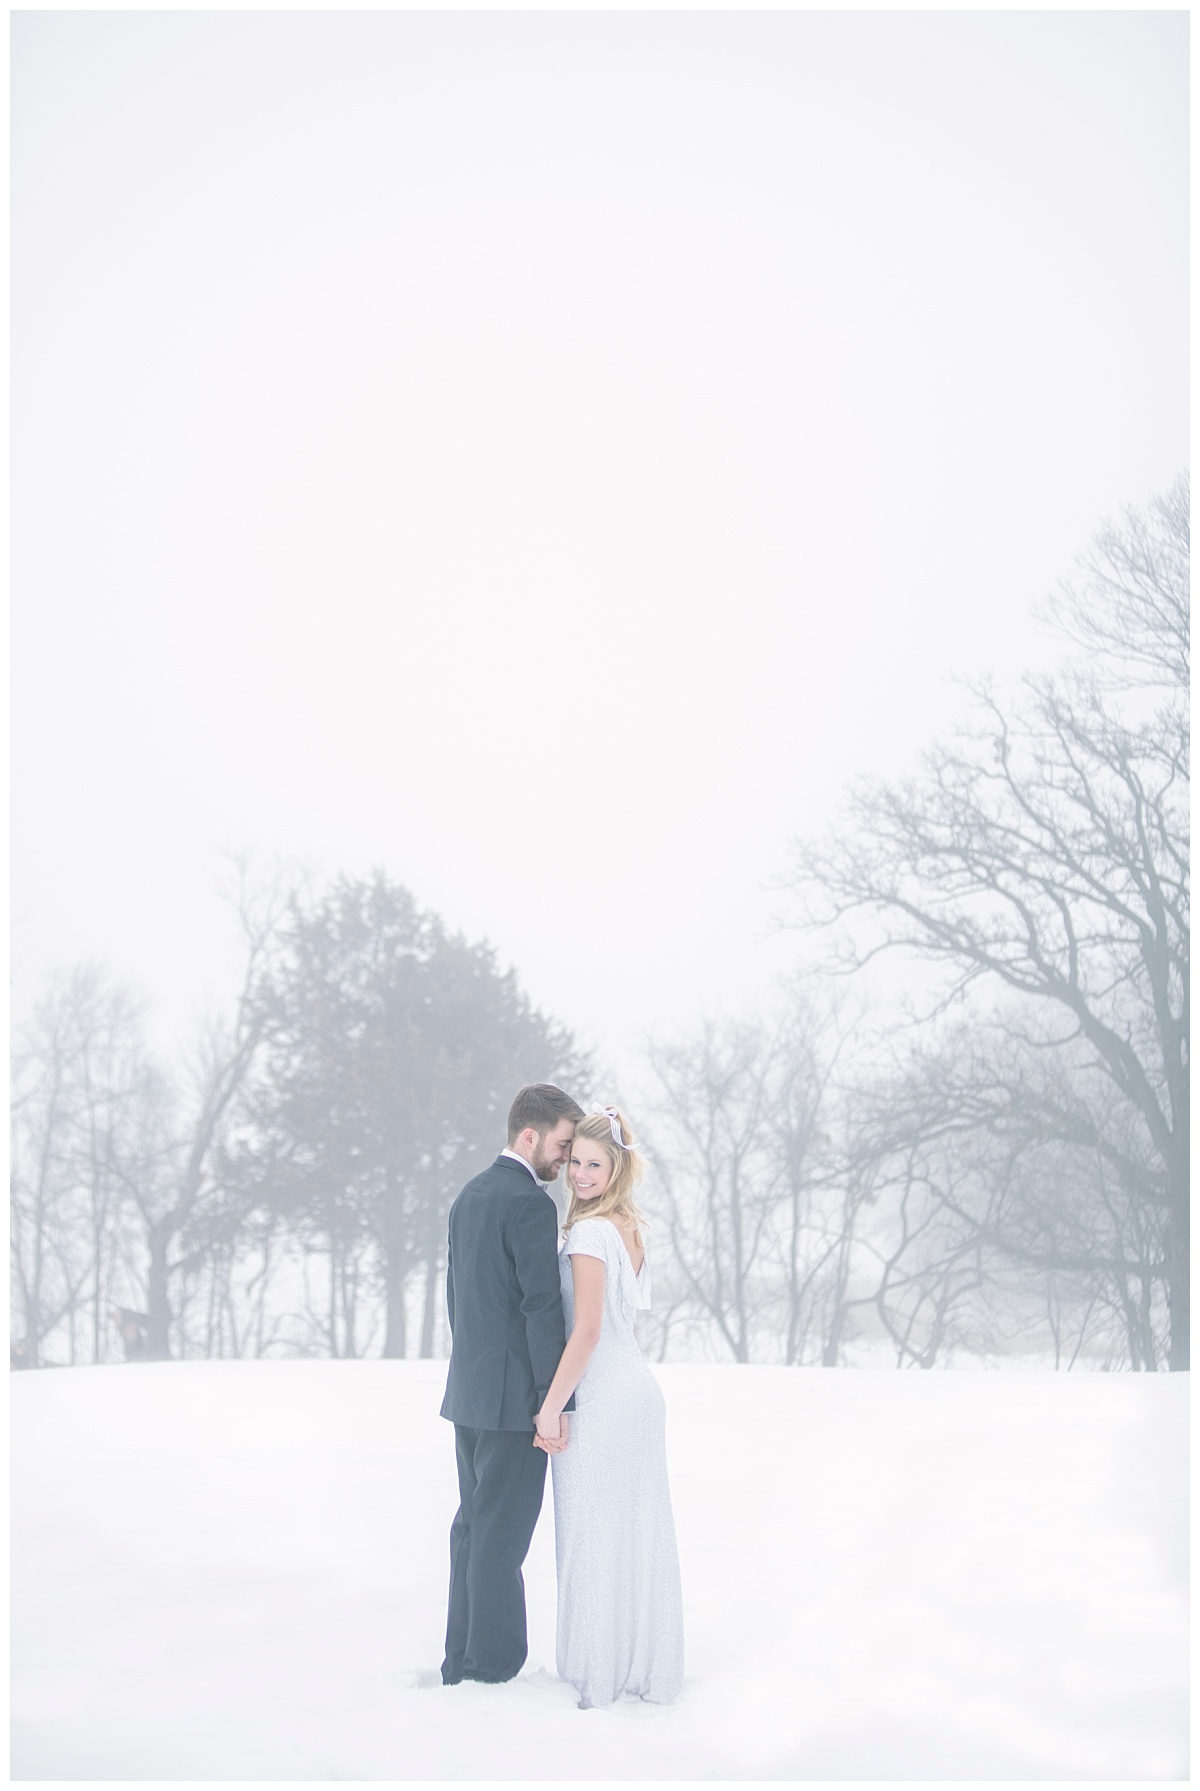 bphotography_winterwedding_siouxfallsweddingphotographer_0038.jpg